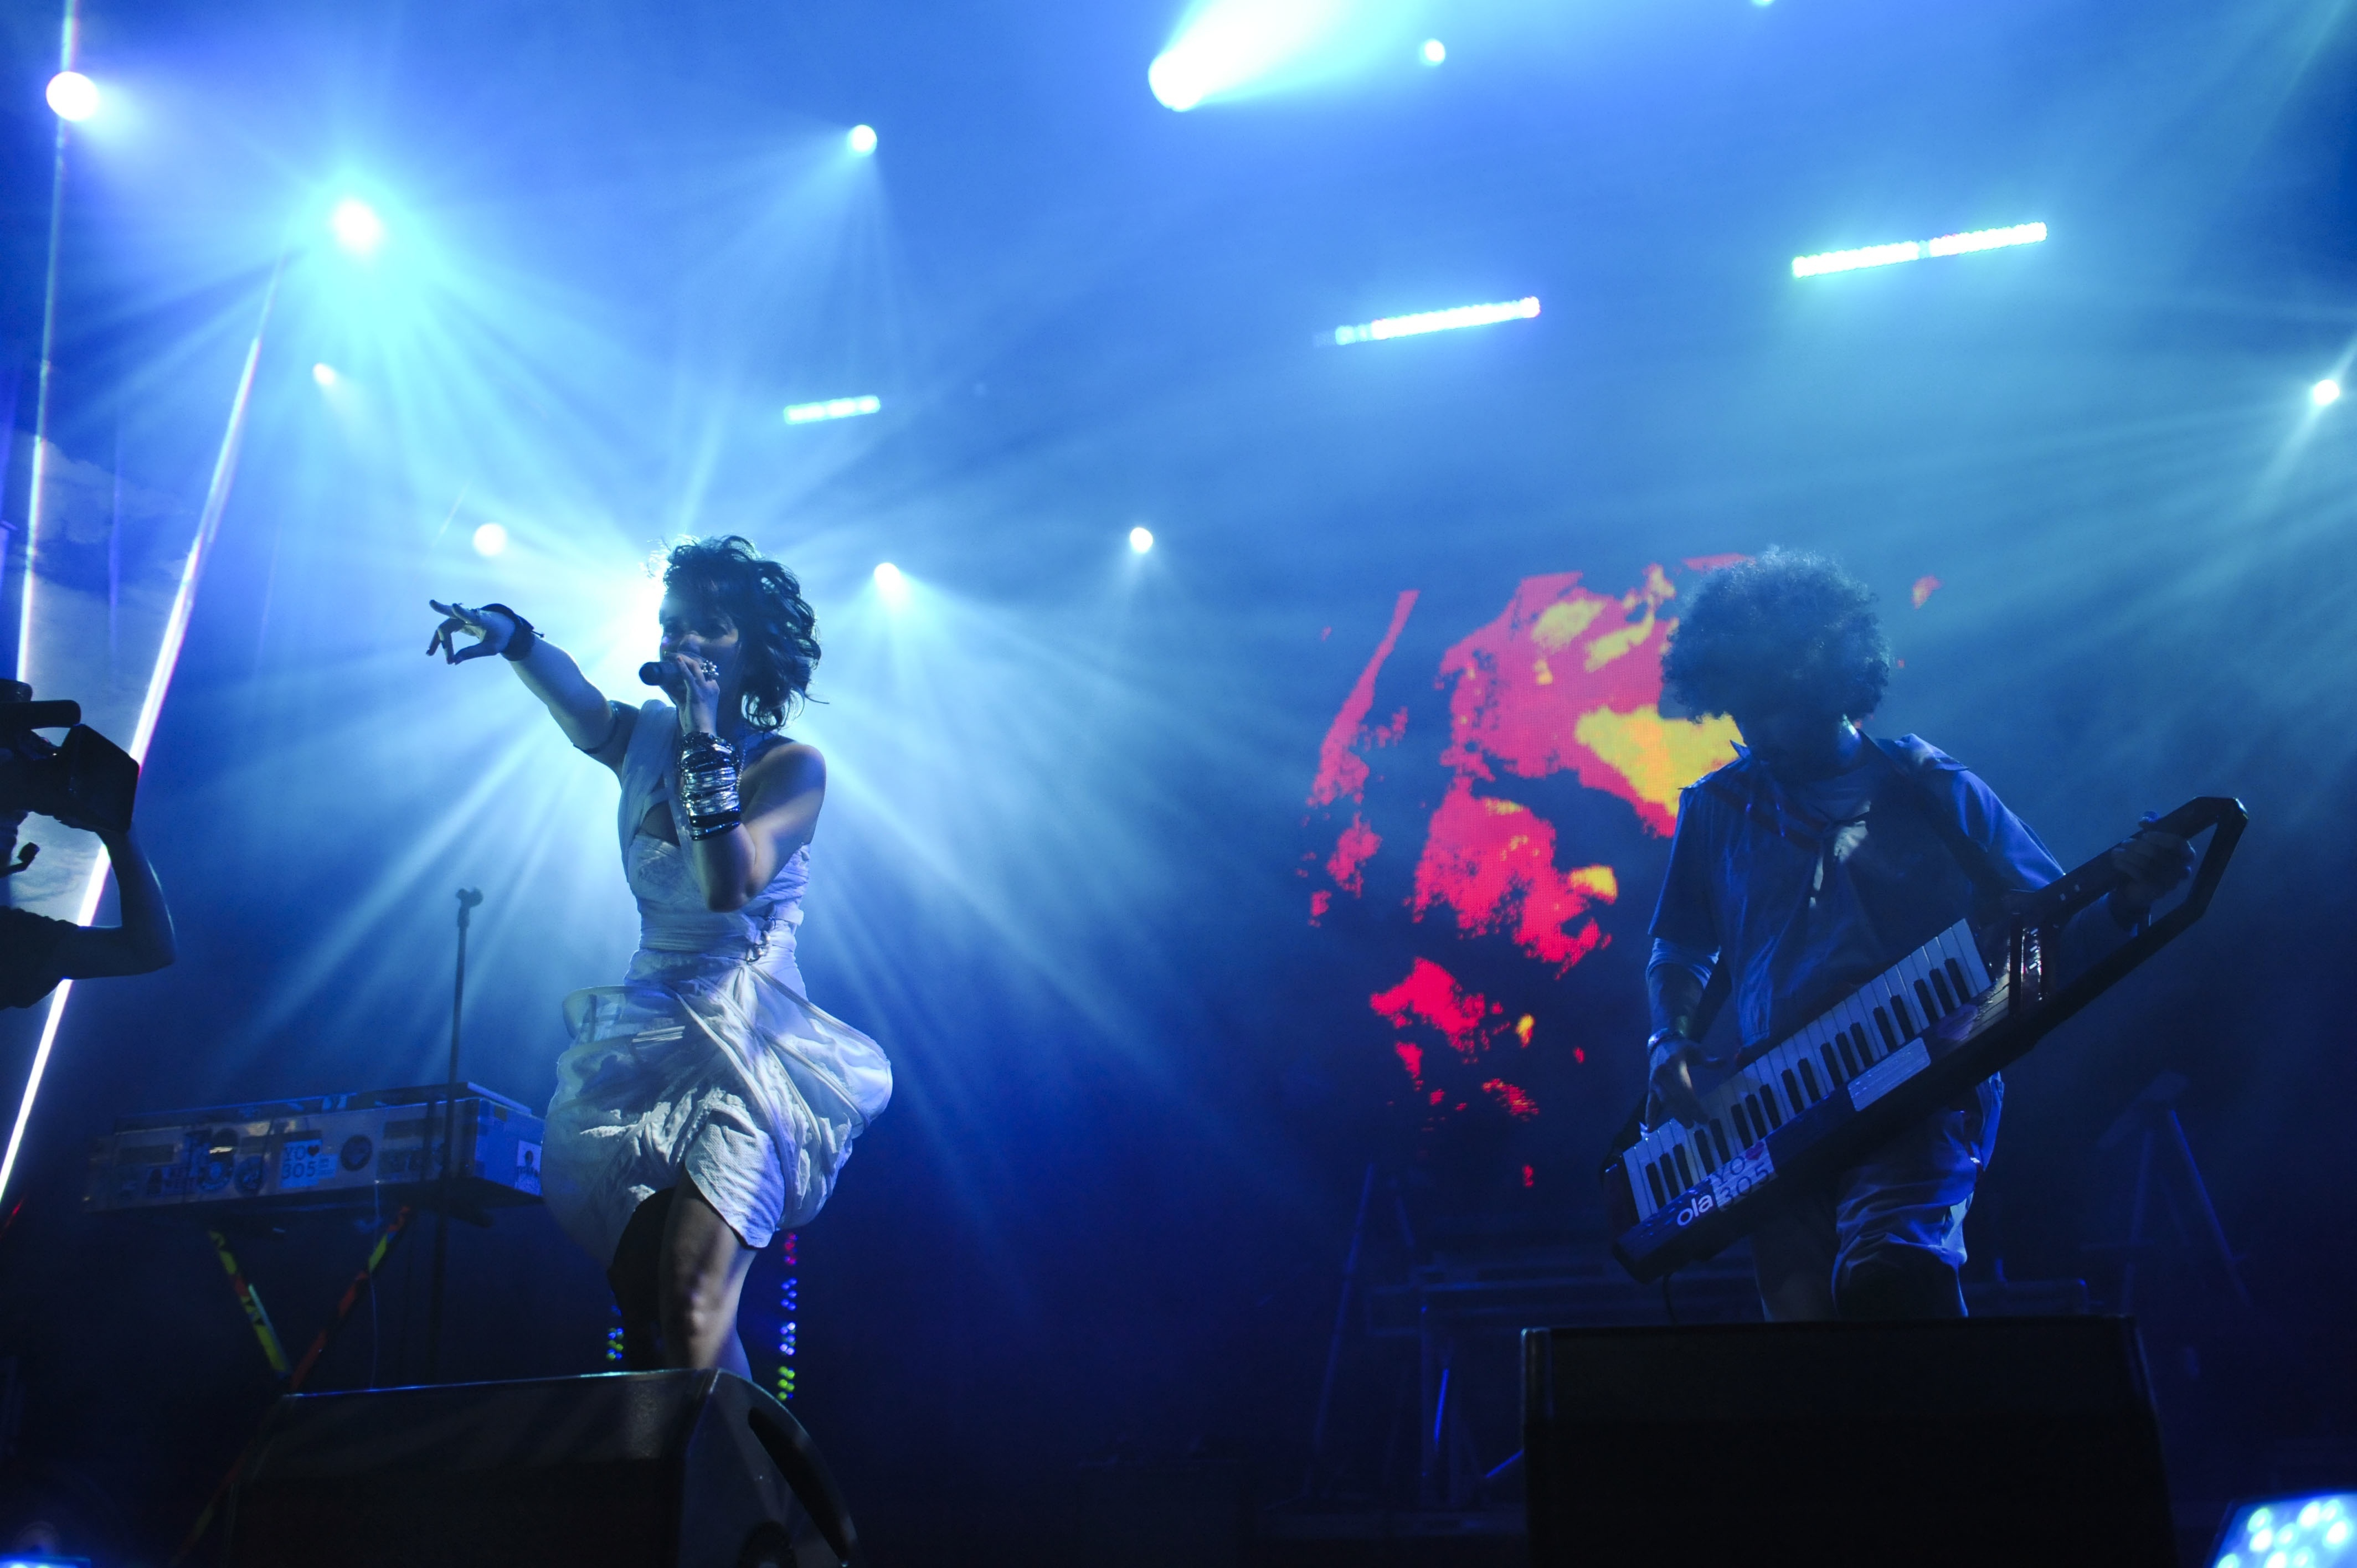 afrobeta live ultra Ultra Music Festival 2014: Must See Sets, Hot Aftershows, and Tasty Bites